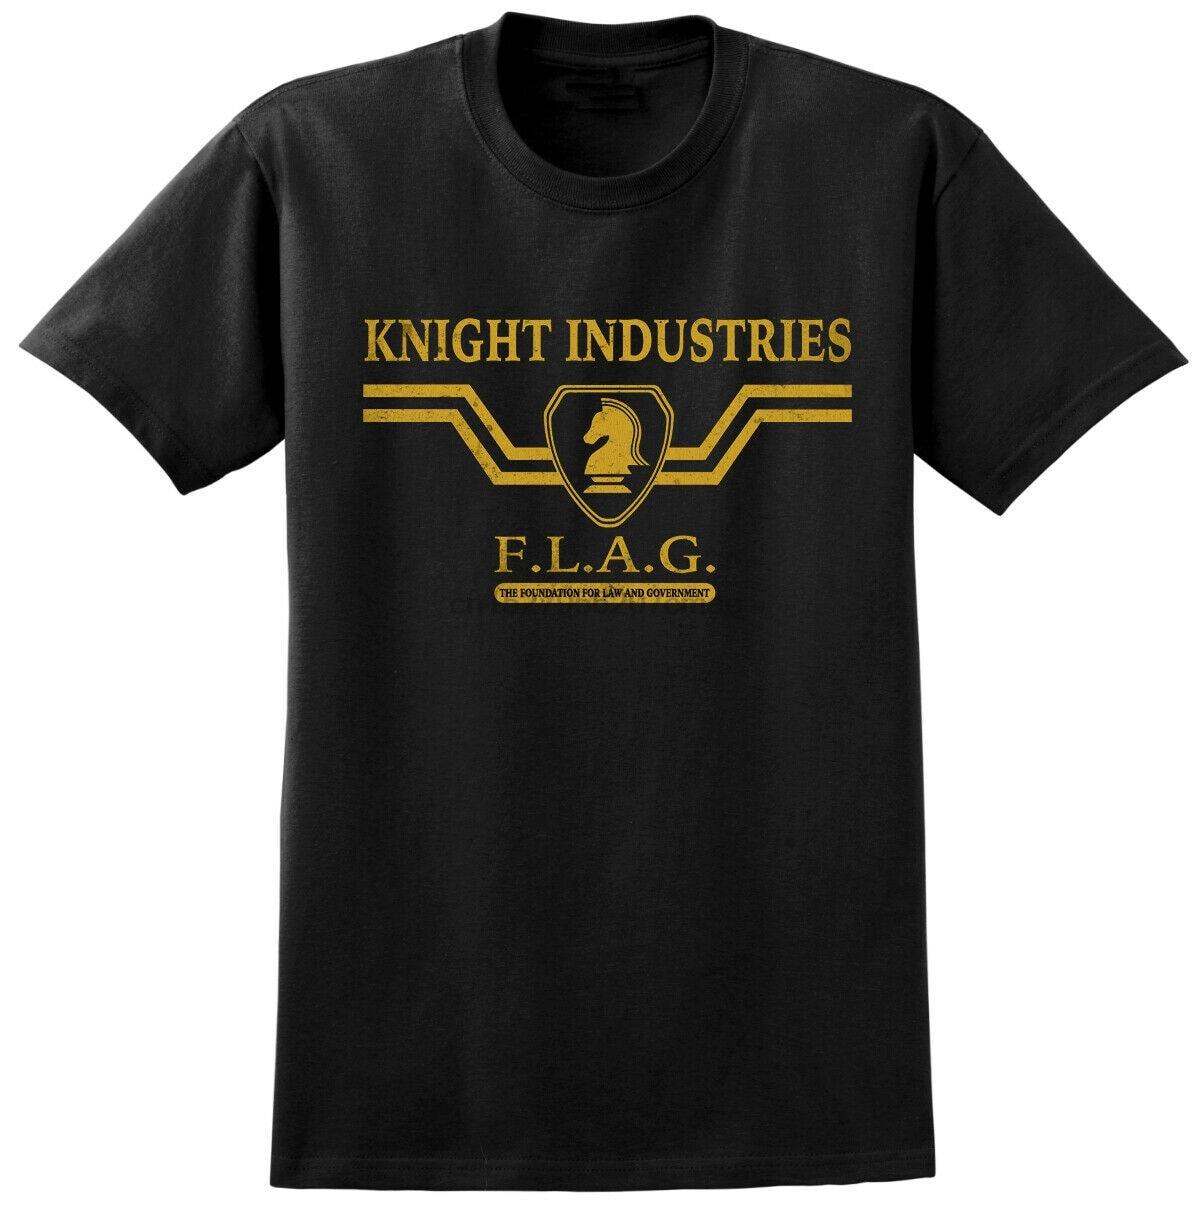 Knight Rider inspirado en camiseta-clásico, Retro 80s TV Tele mostrar Tee-KITT Coche